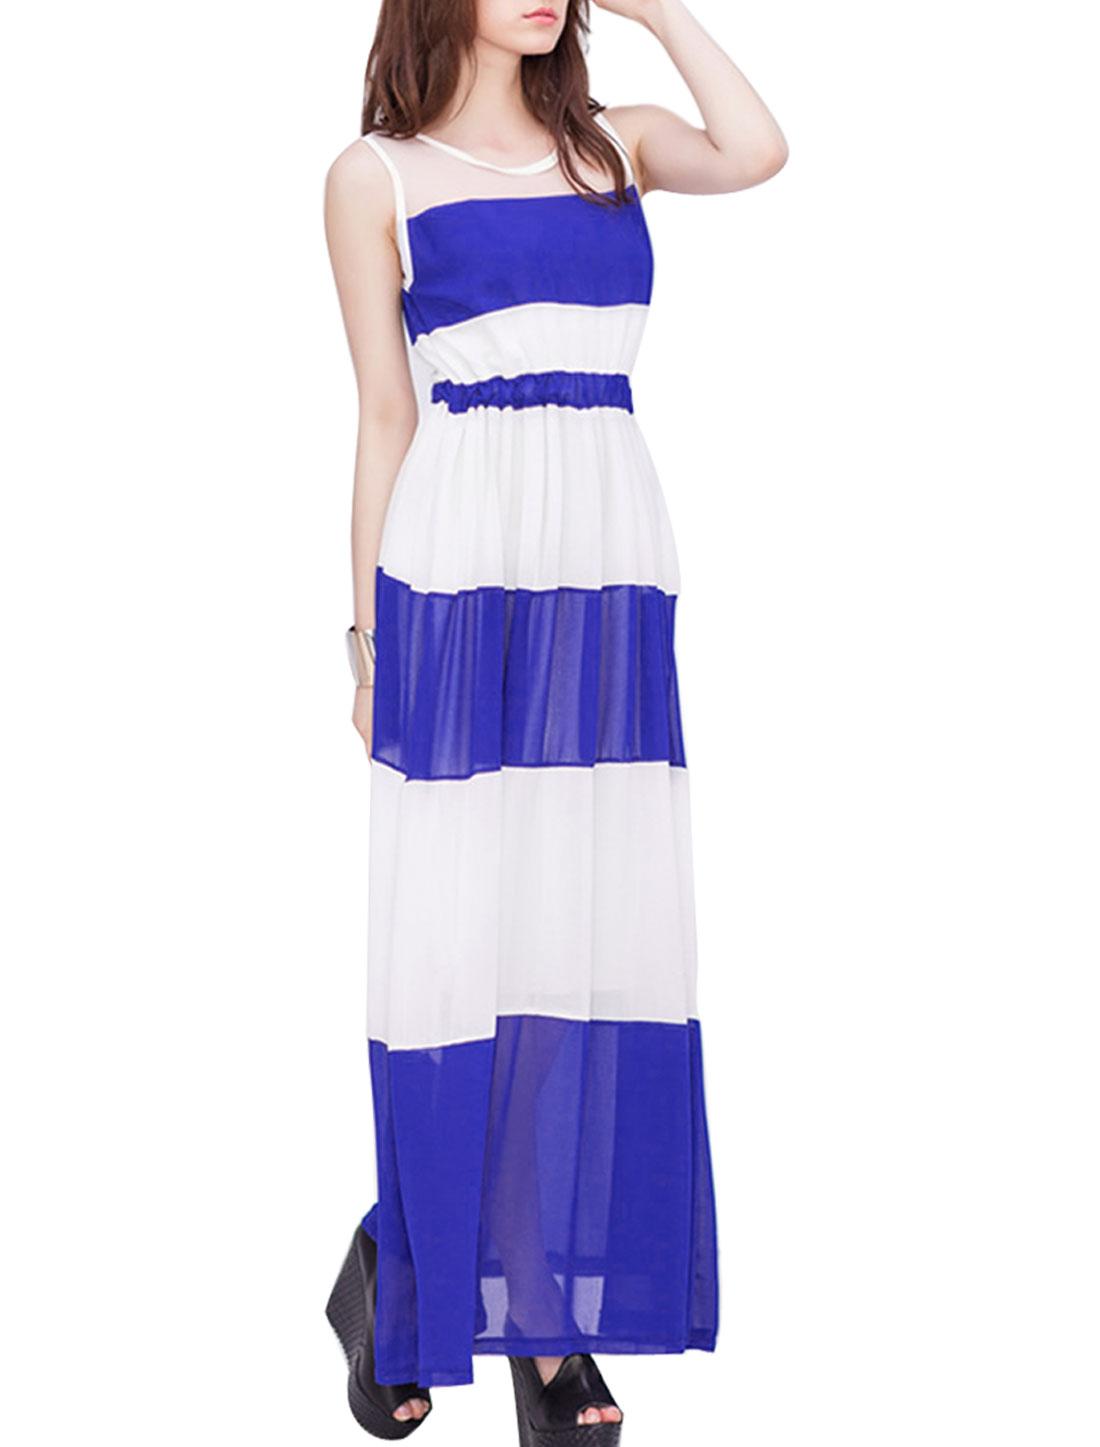 Women Mesh Spliced Sleeveless Block Color Chiffon Dress Blue XS